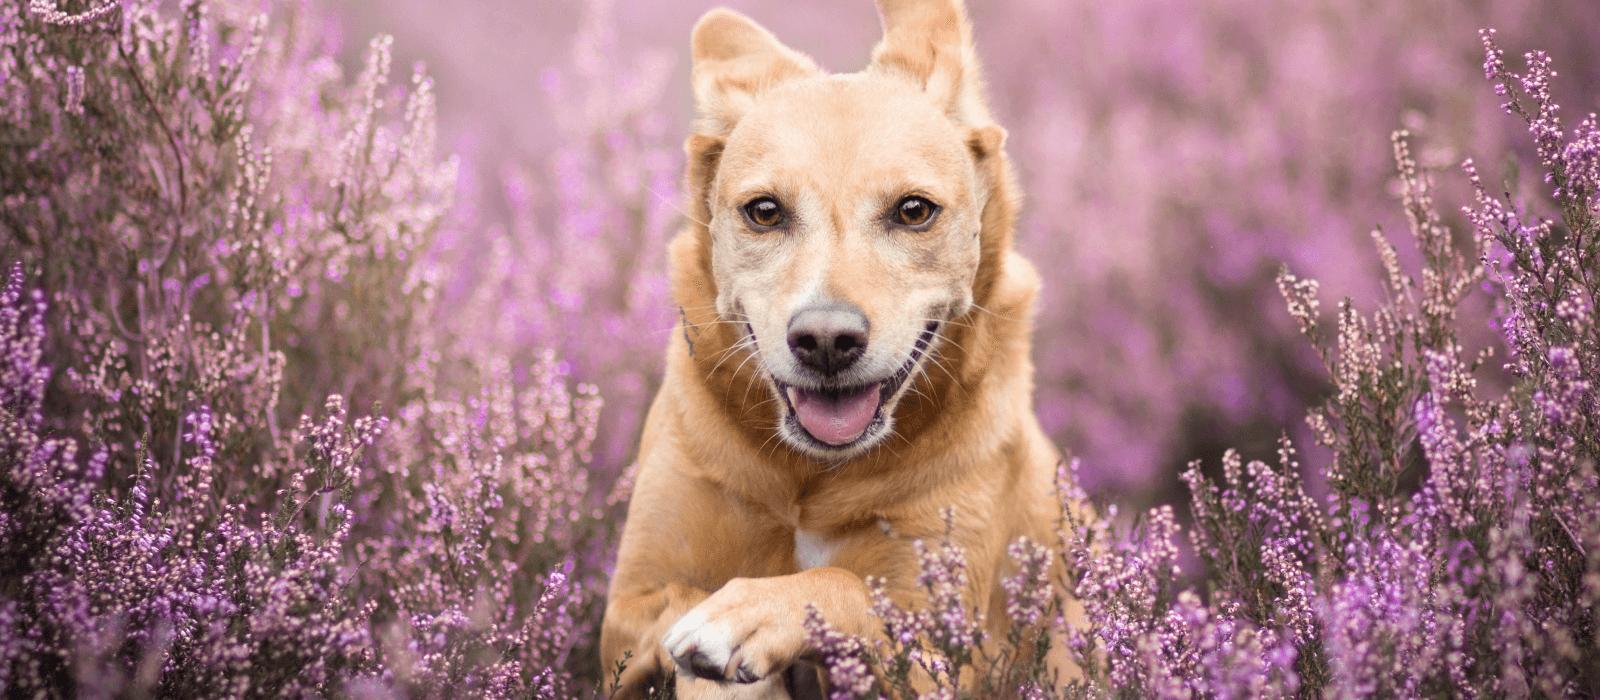 Dog running through field.